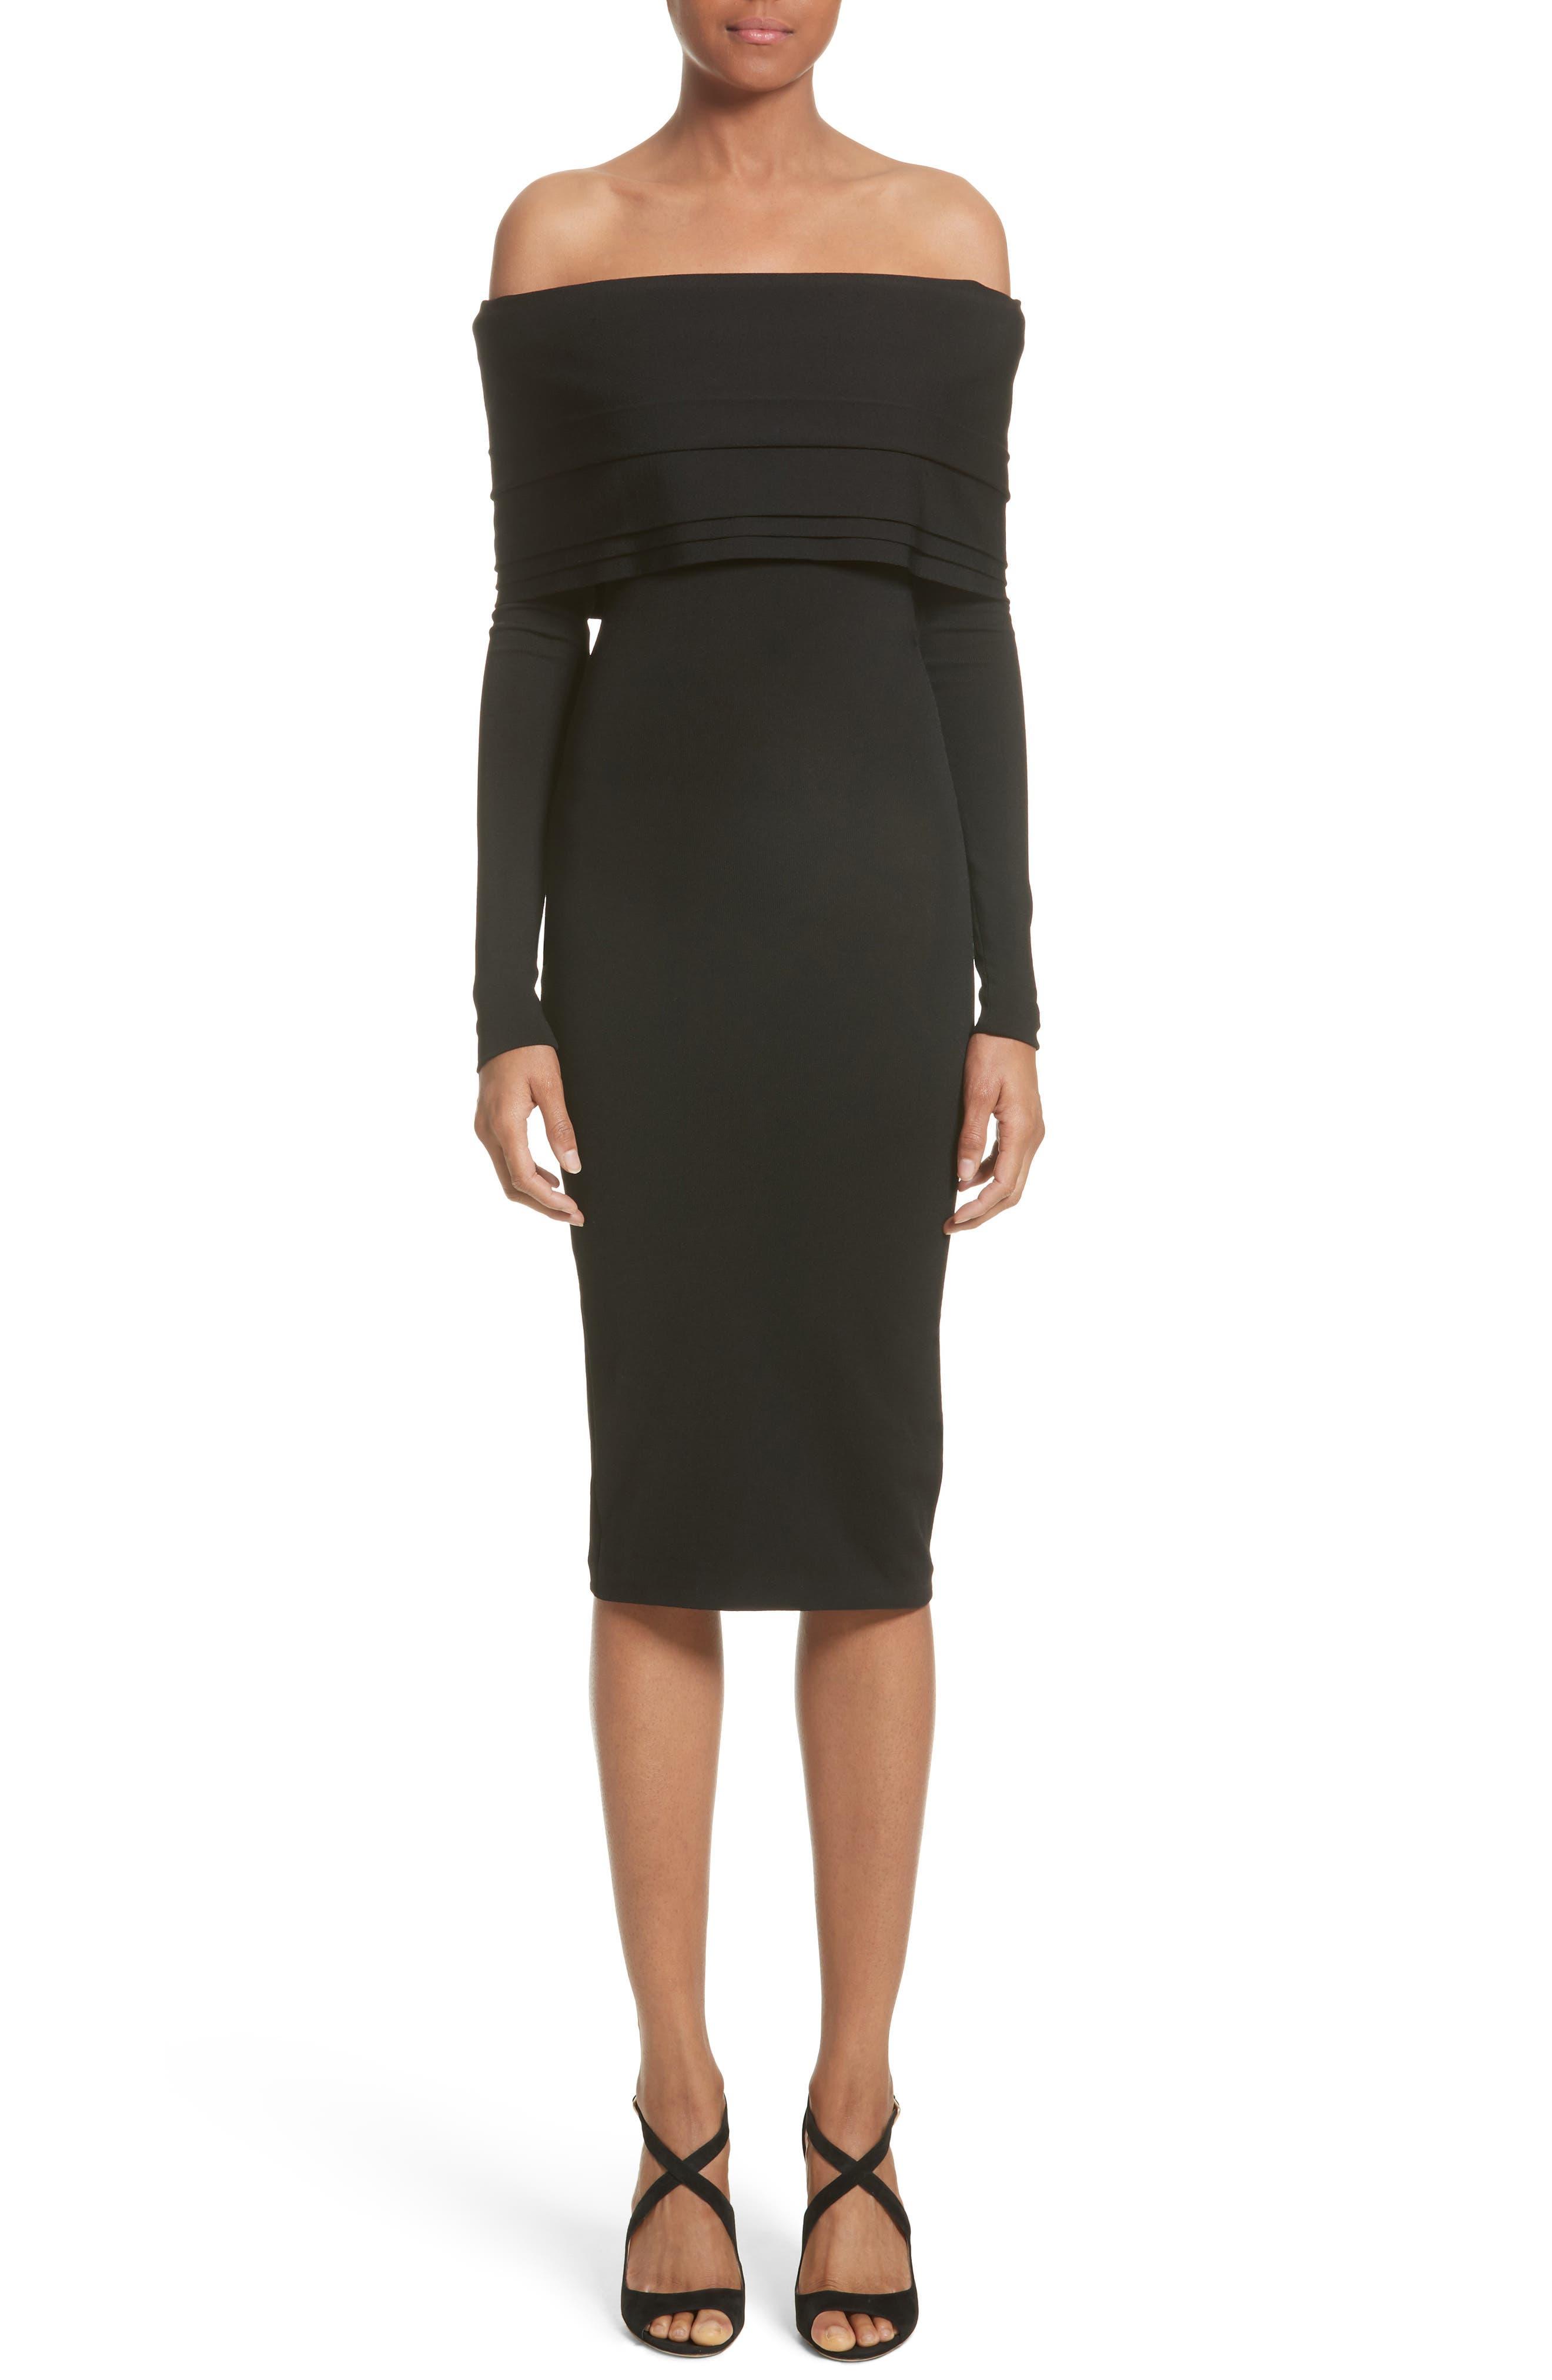 Layered Knit Off the Shoulder Dress,                             Main thumbnail 1, color,                             Black